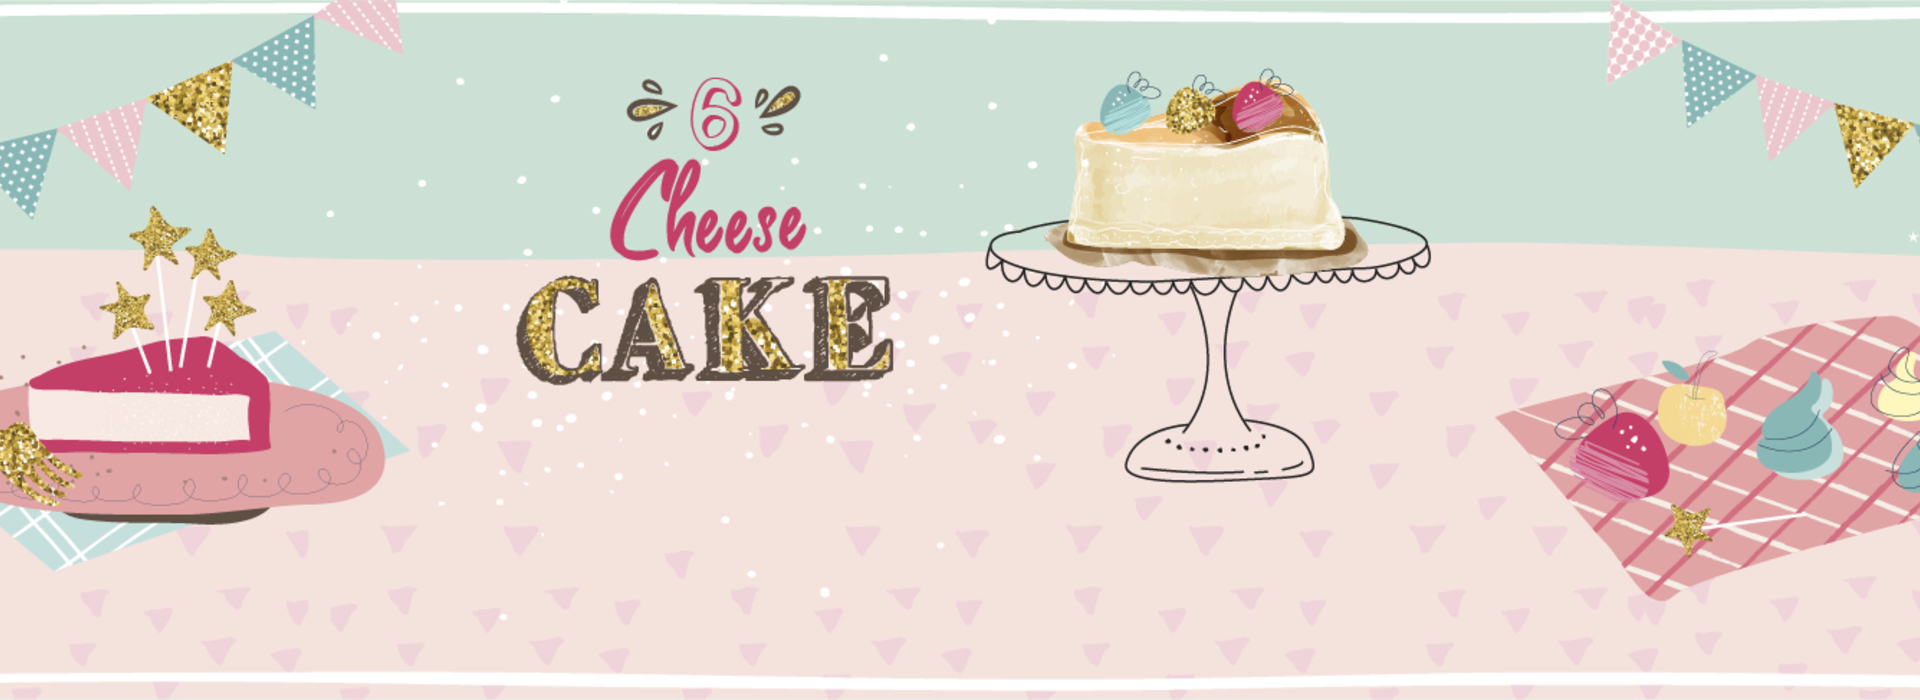 Seis Cheesecake de Aliter Dulcia (Y seis recetas más para triunfar)